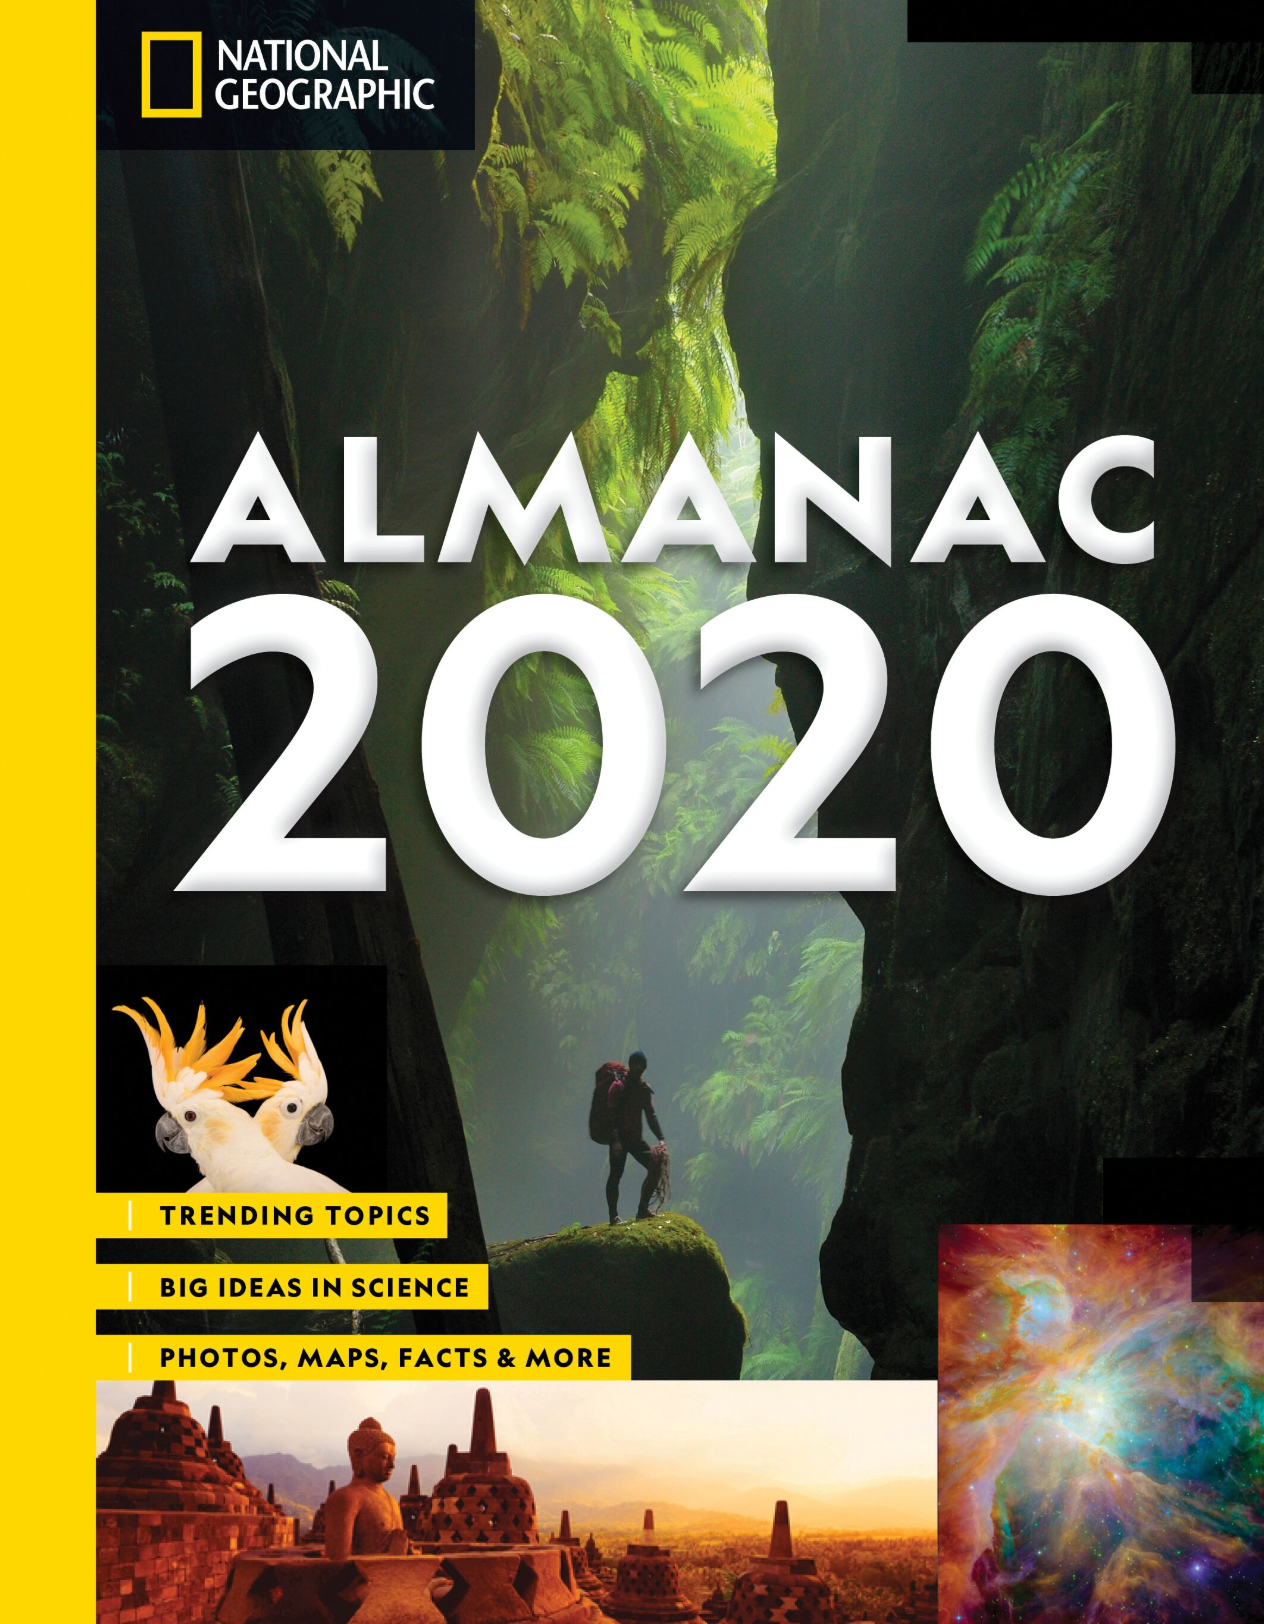 National Geographic's Almanac 2020